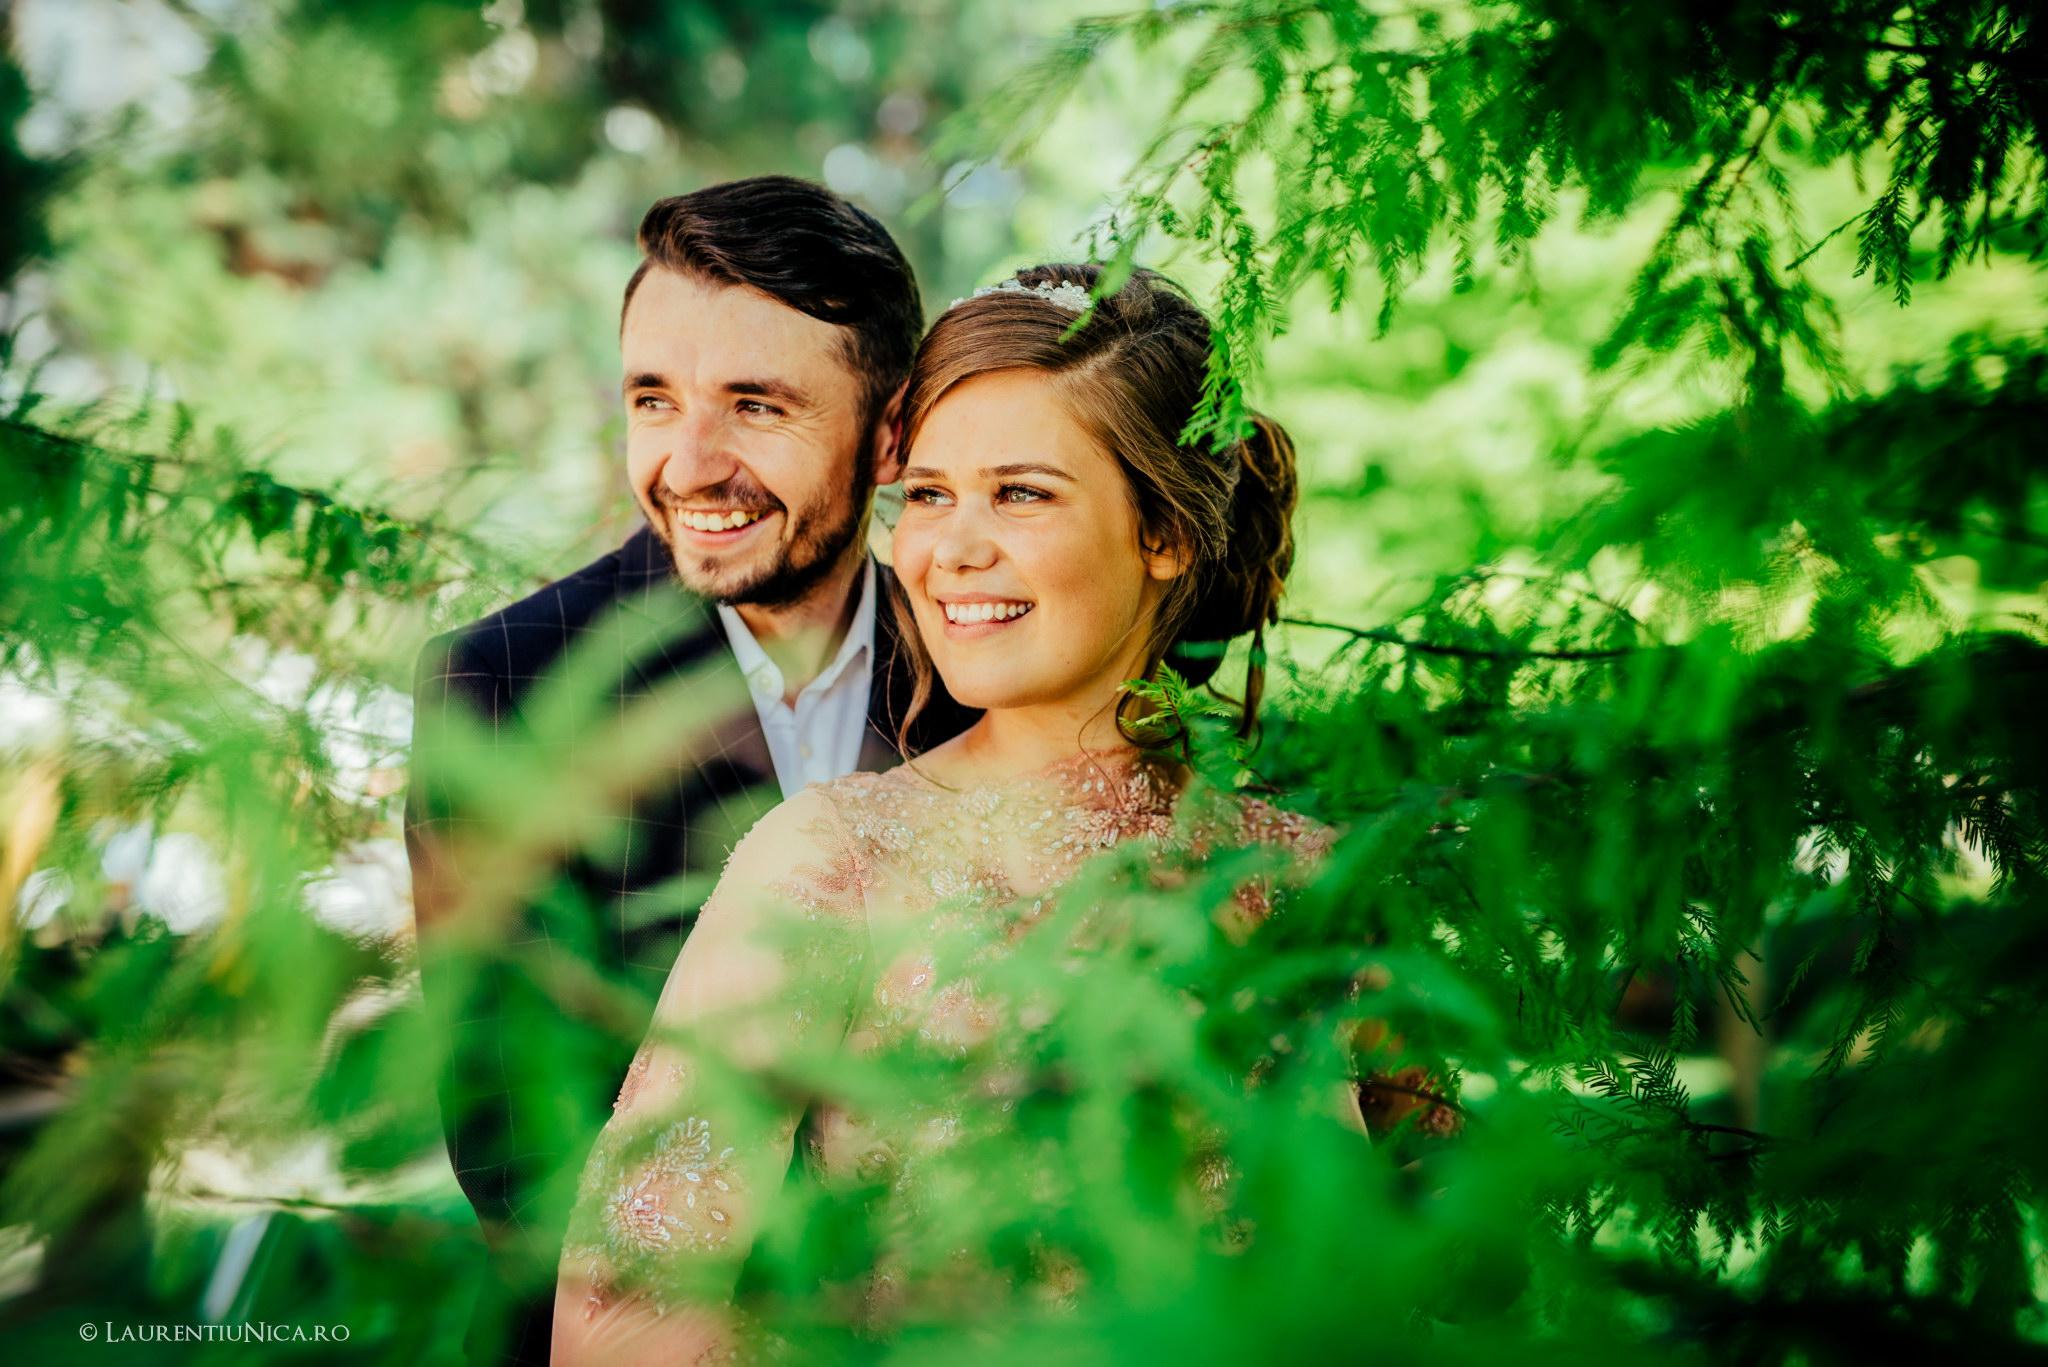 Alina si Andrei fotograf nunta laurentiu nica craiova 07 - Alina & Andrei | Fotografii nunta